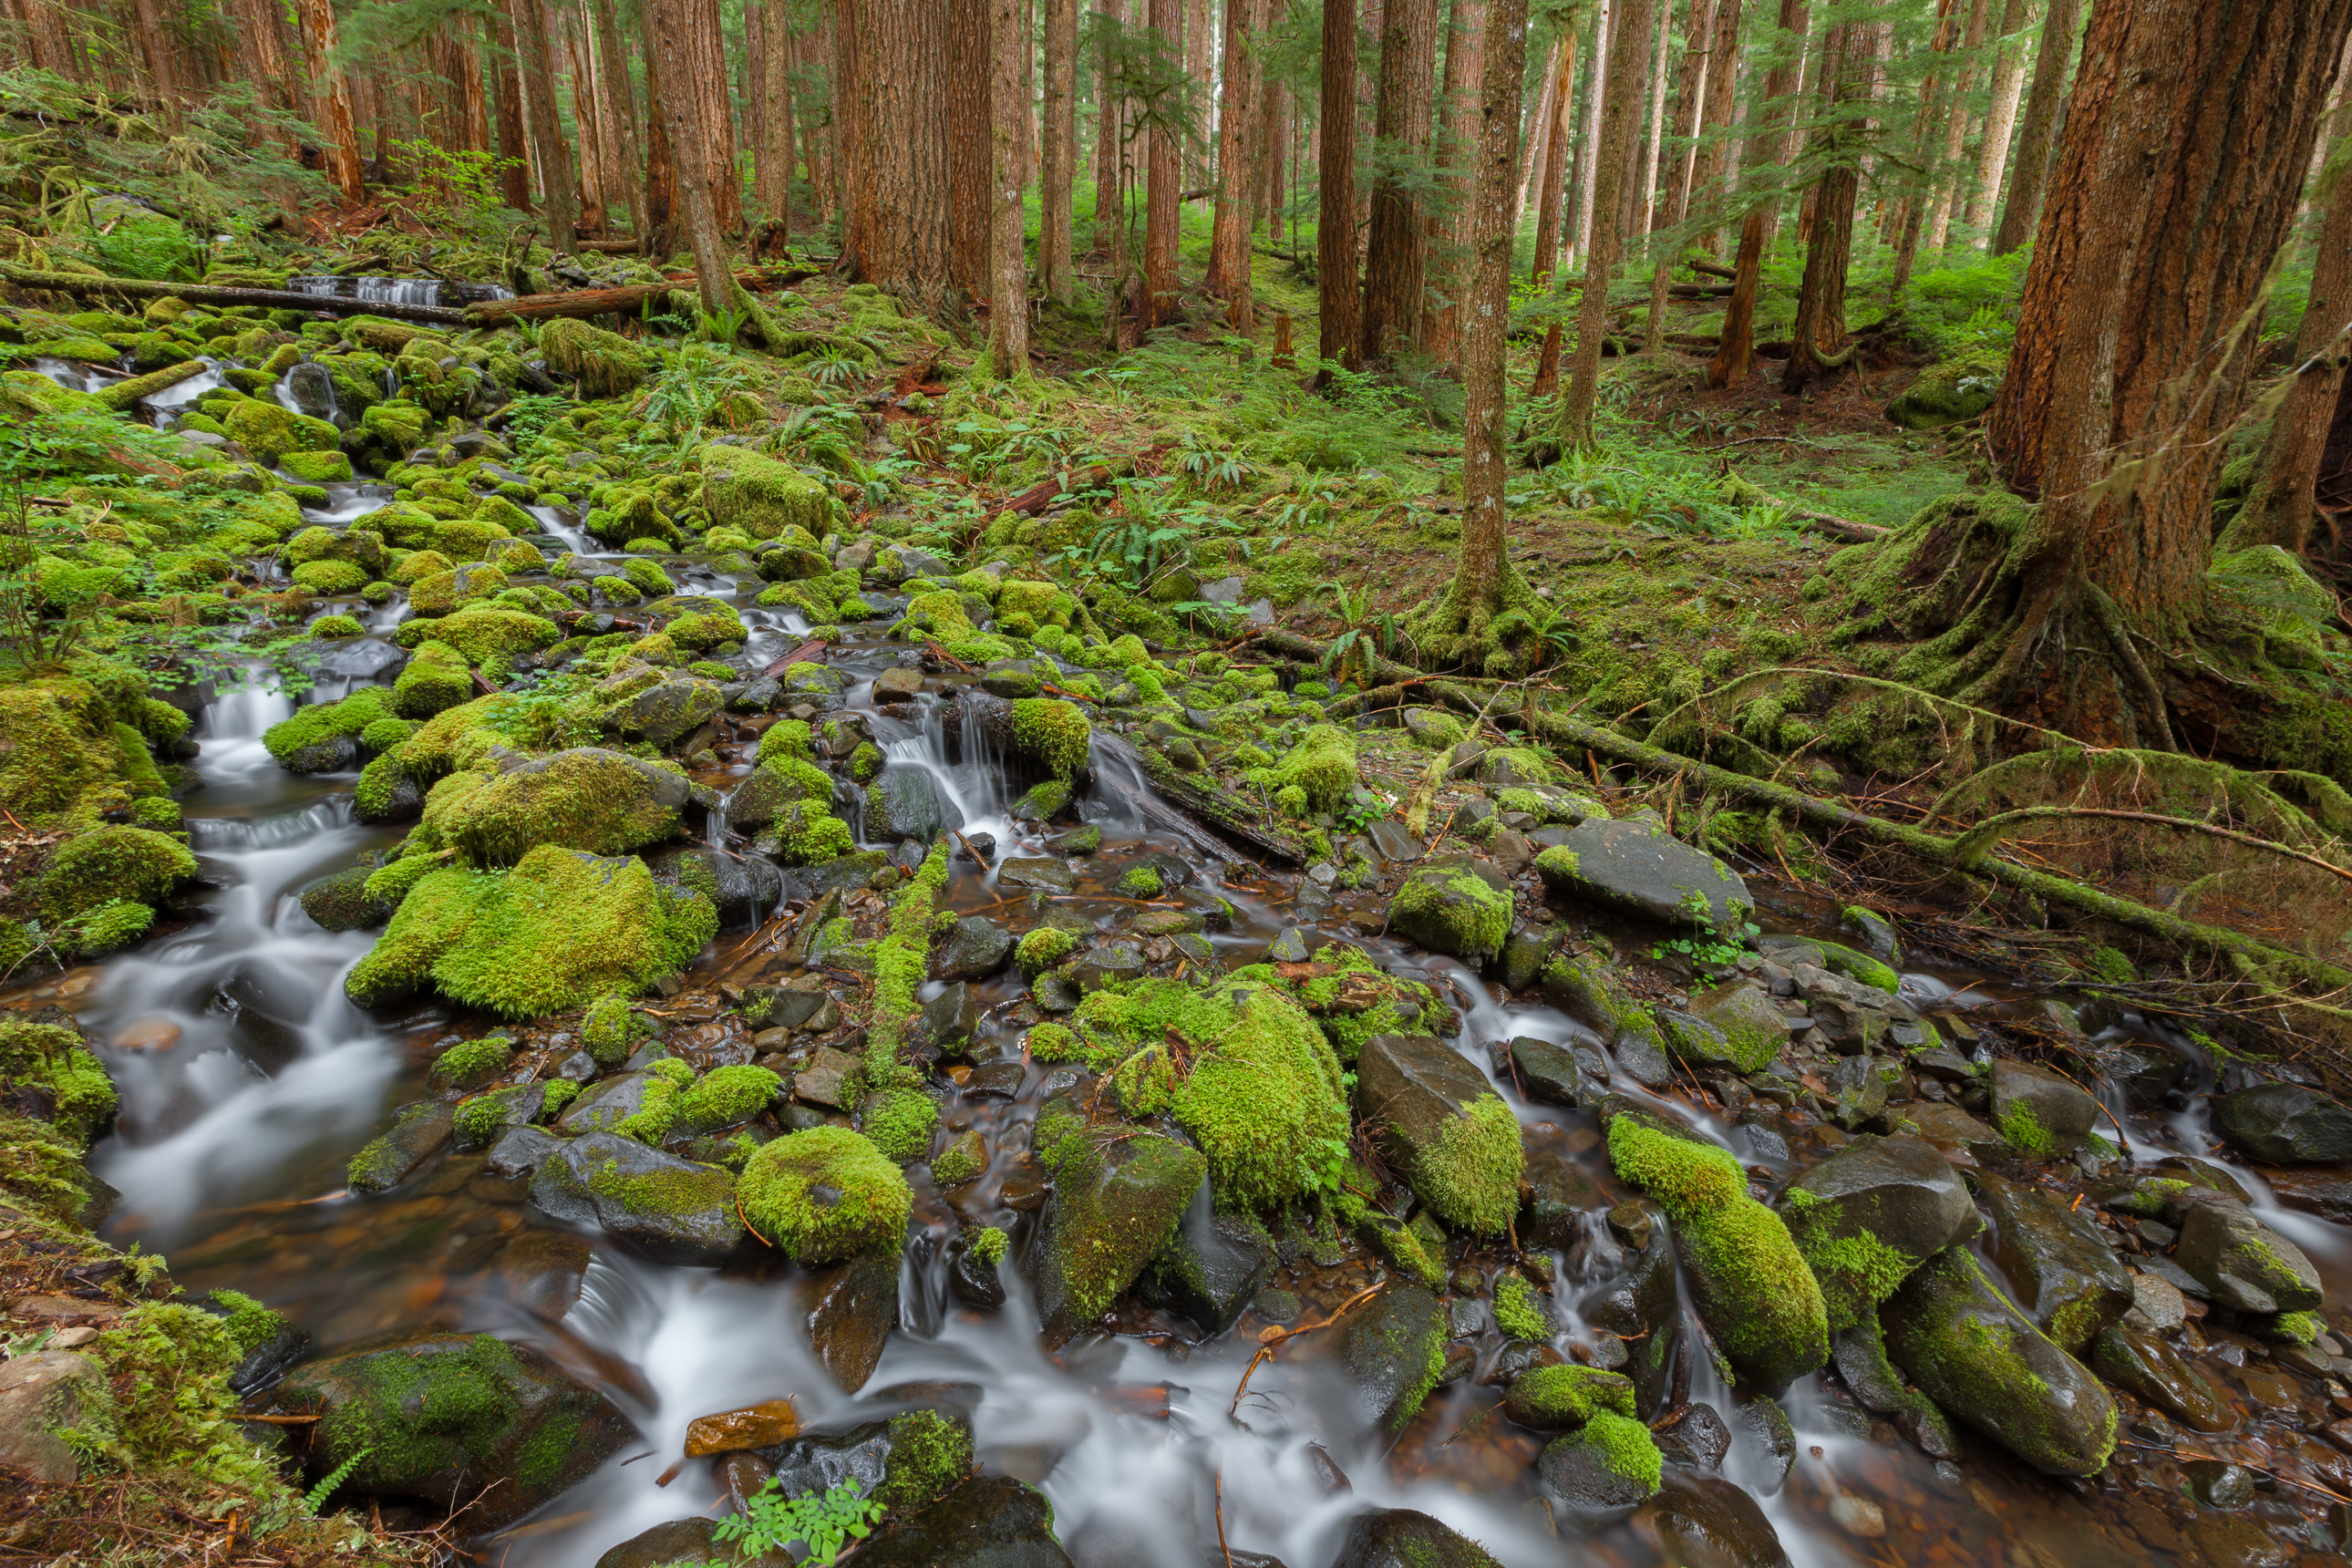 Rainforest stream in Olympic National Park